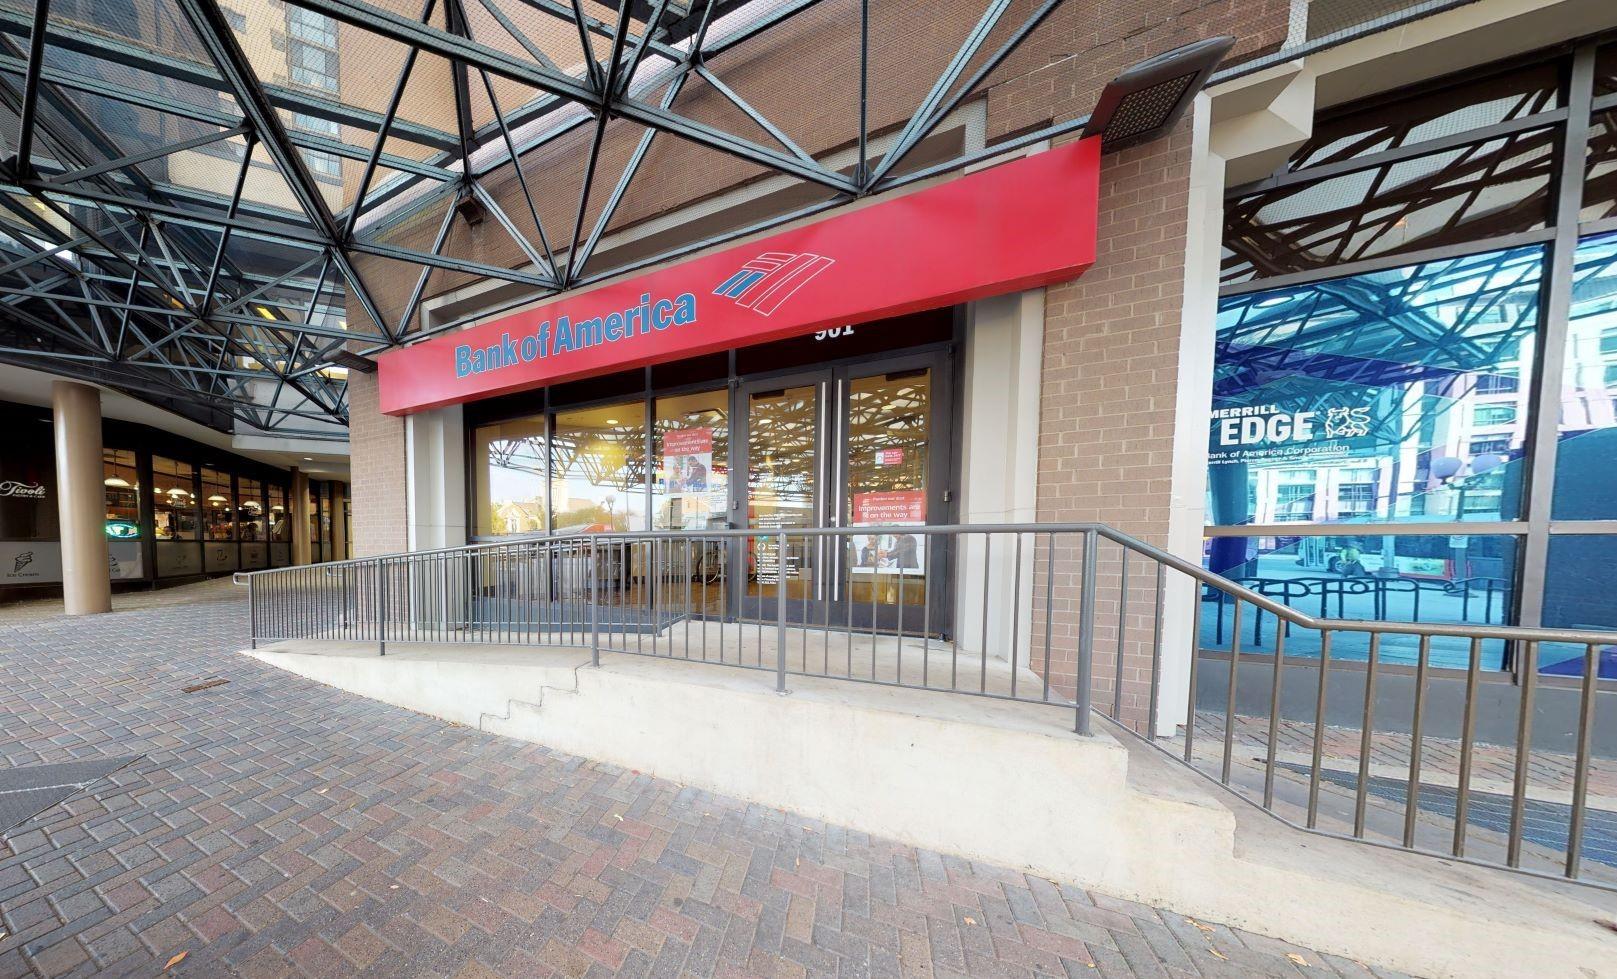 Bank of America financial center with walk-up ATM   901 N Stuart St STE 100, Arlington, VA 22203